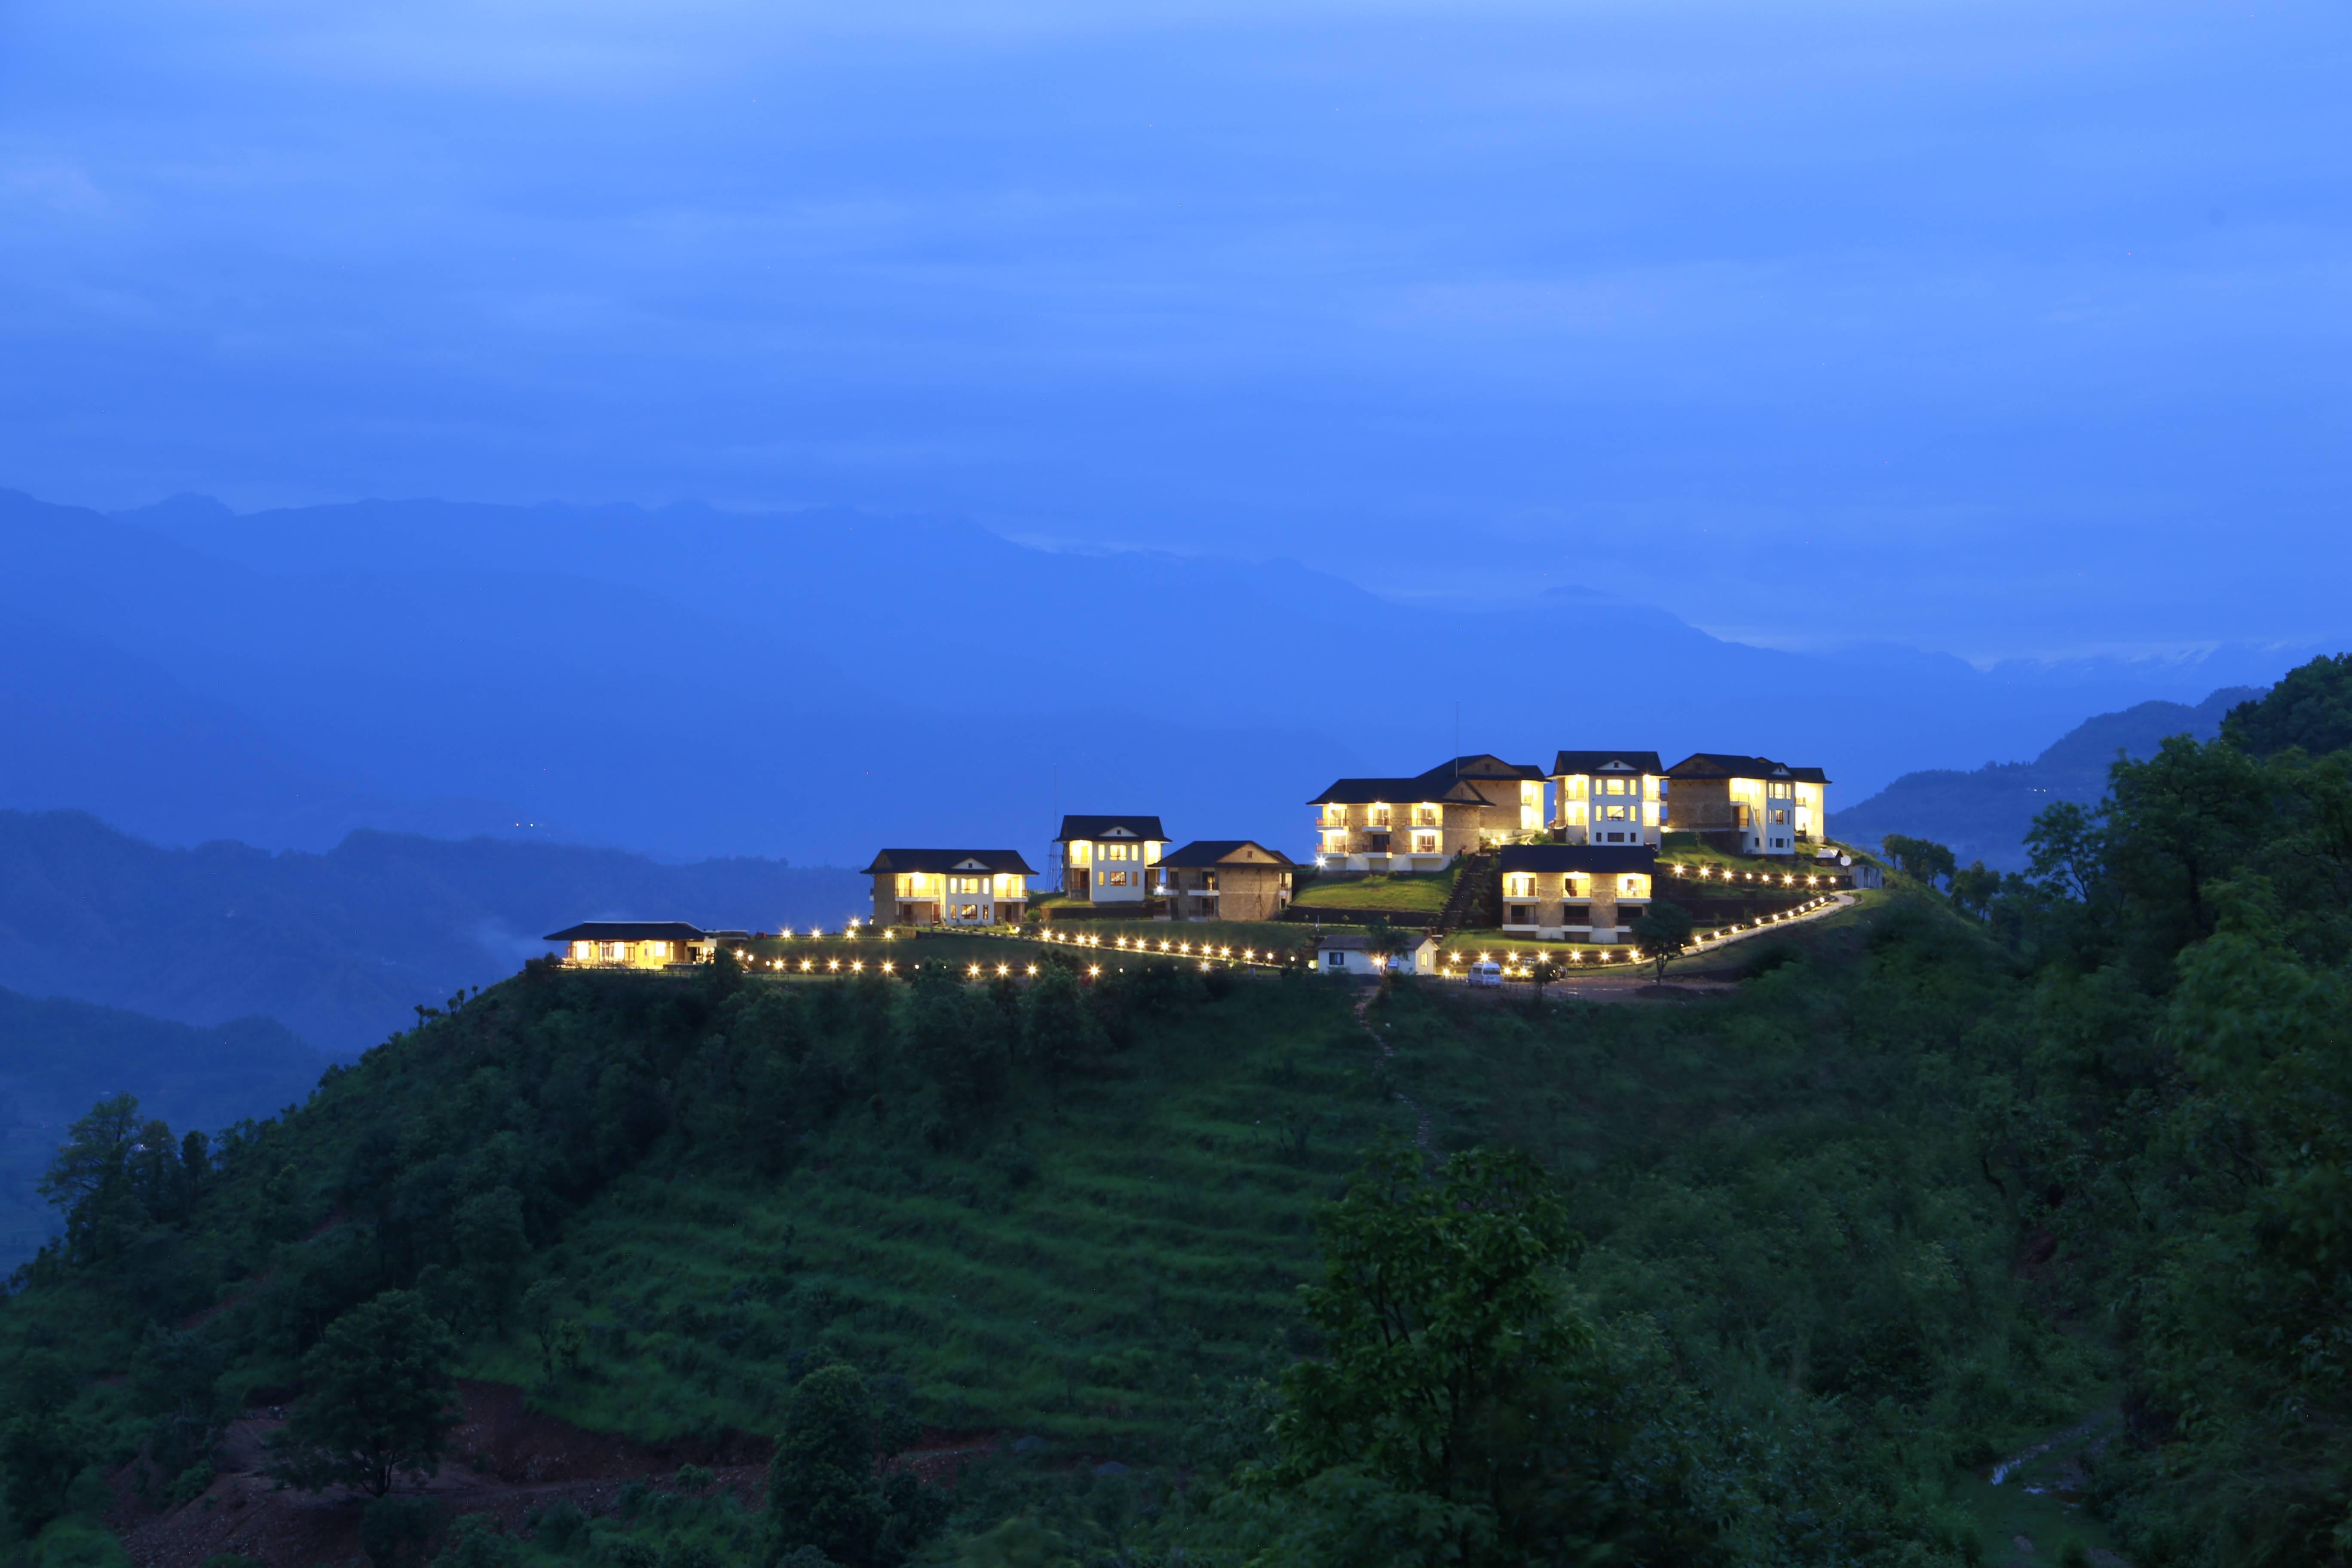 Hills nature rupakot lights greenery evening